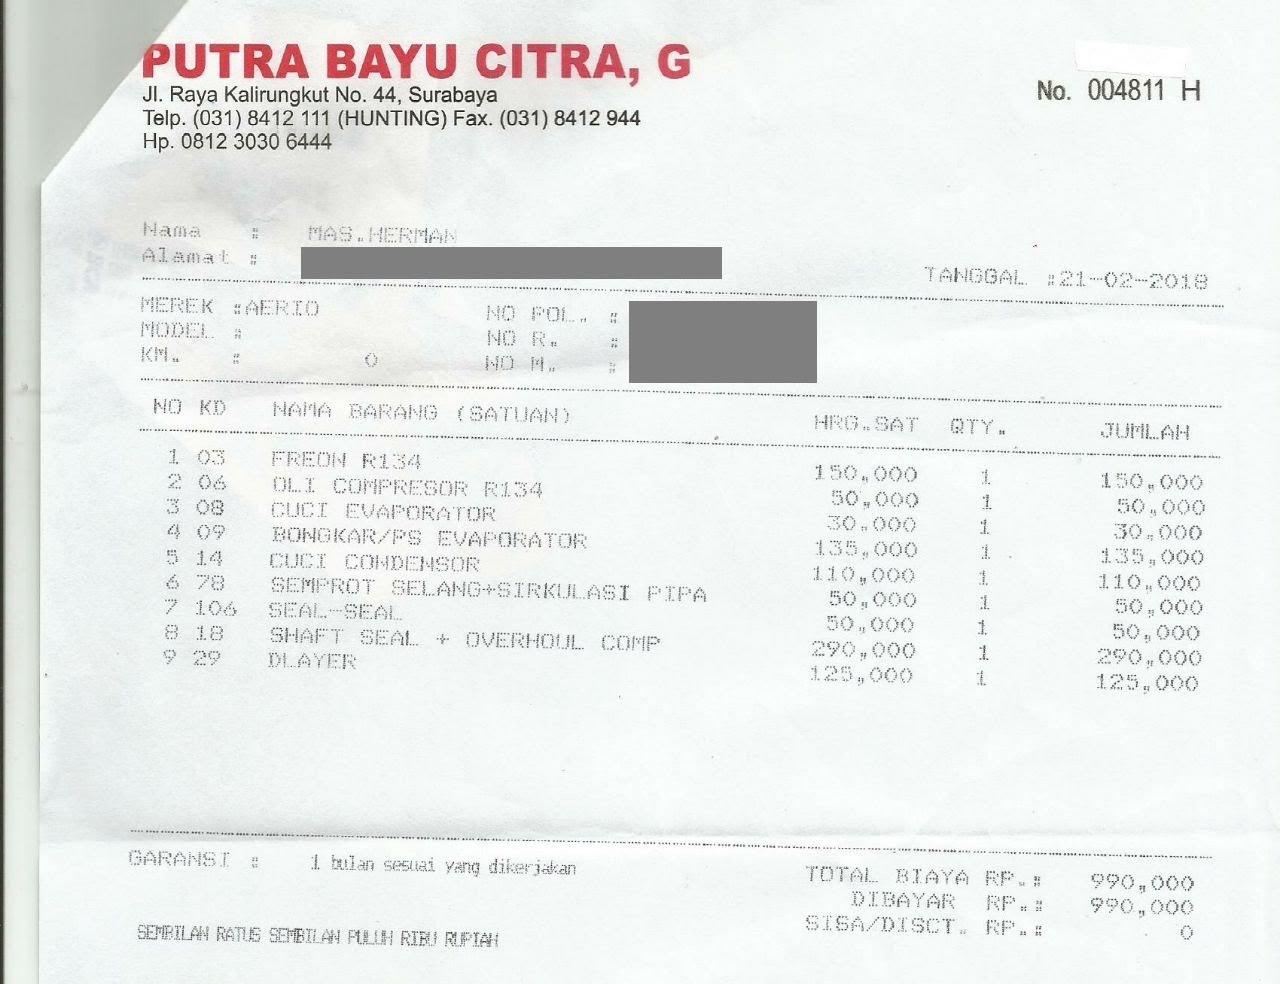 Share Biaya Service Ac Aerio Di Putra Bayu Rungkut Surabaya Herman Aic 326